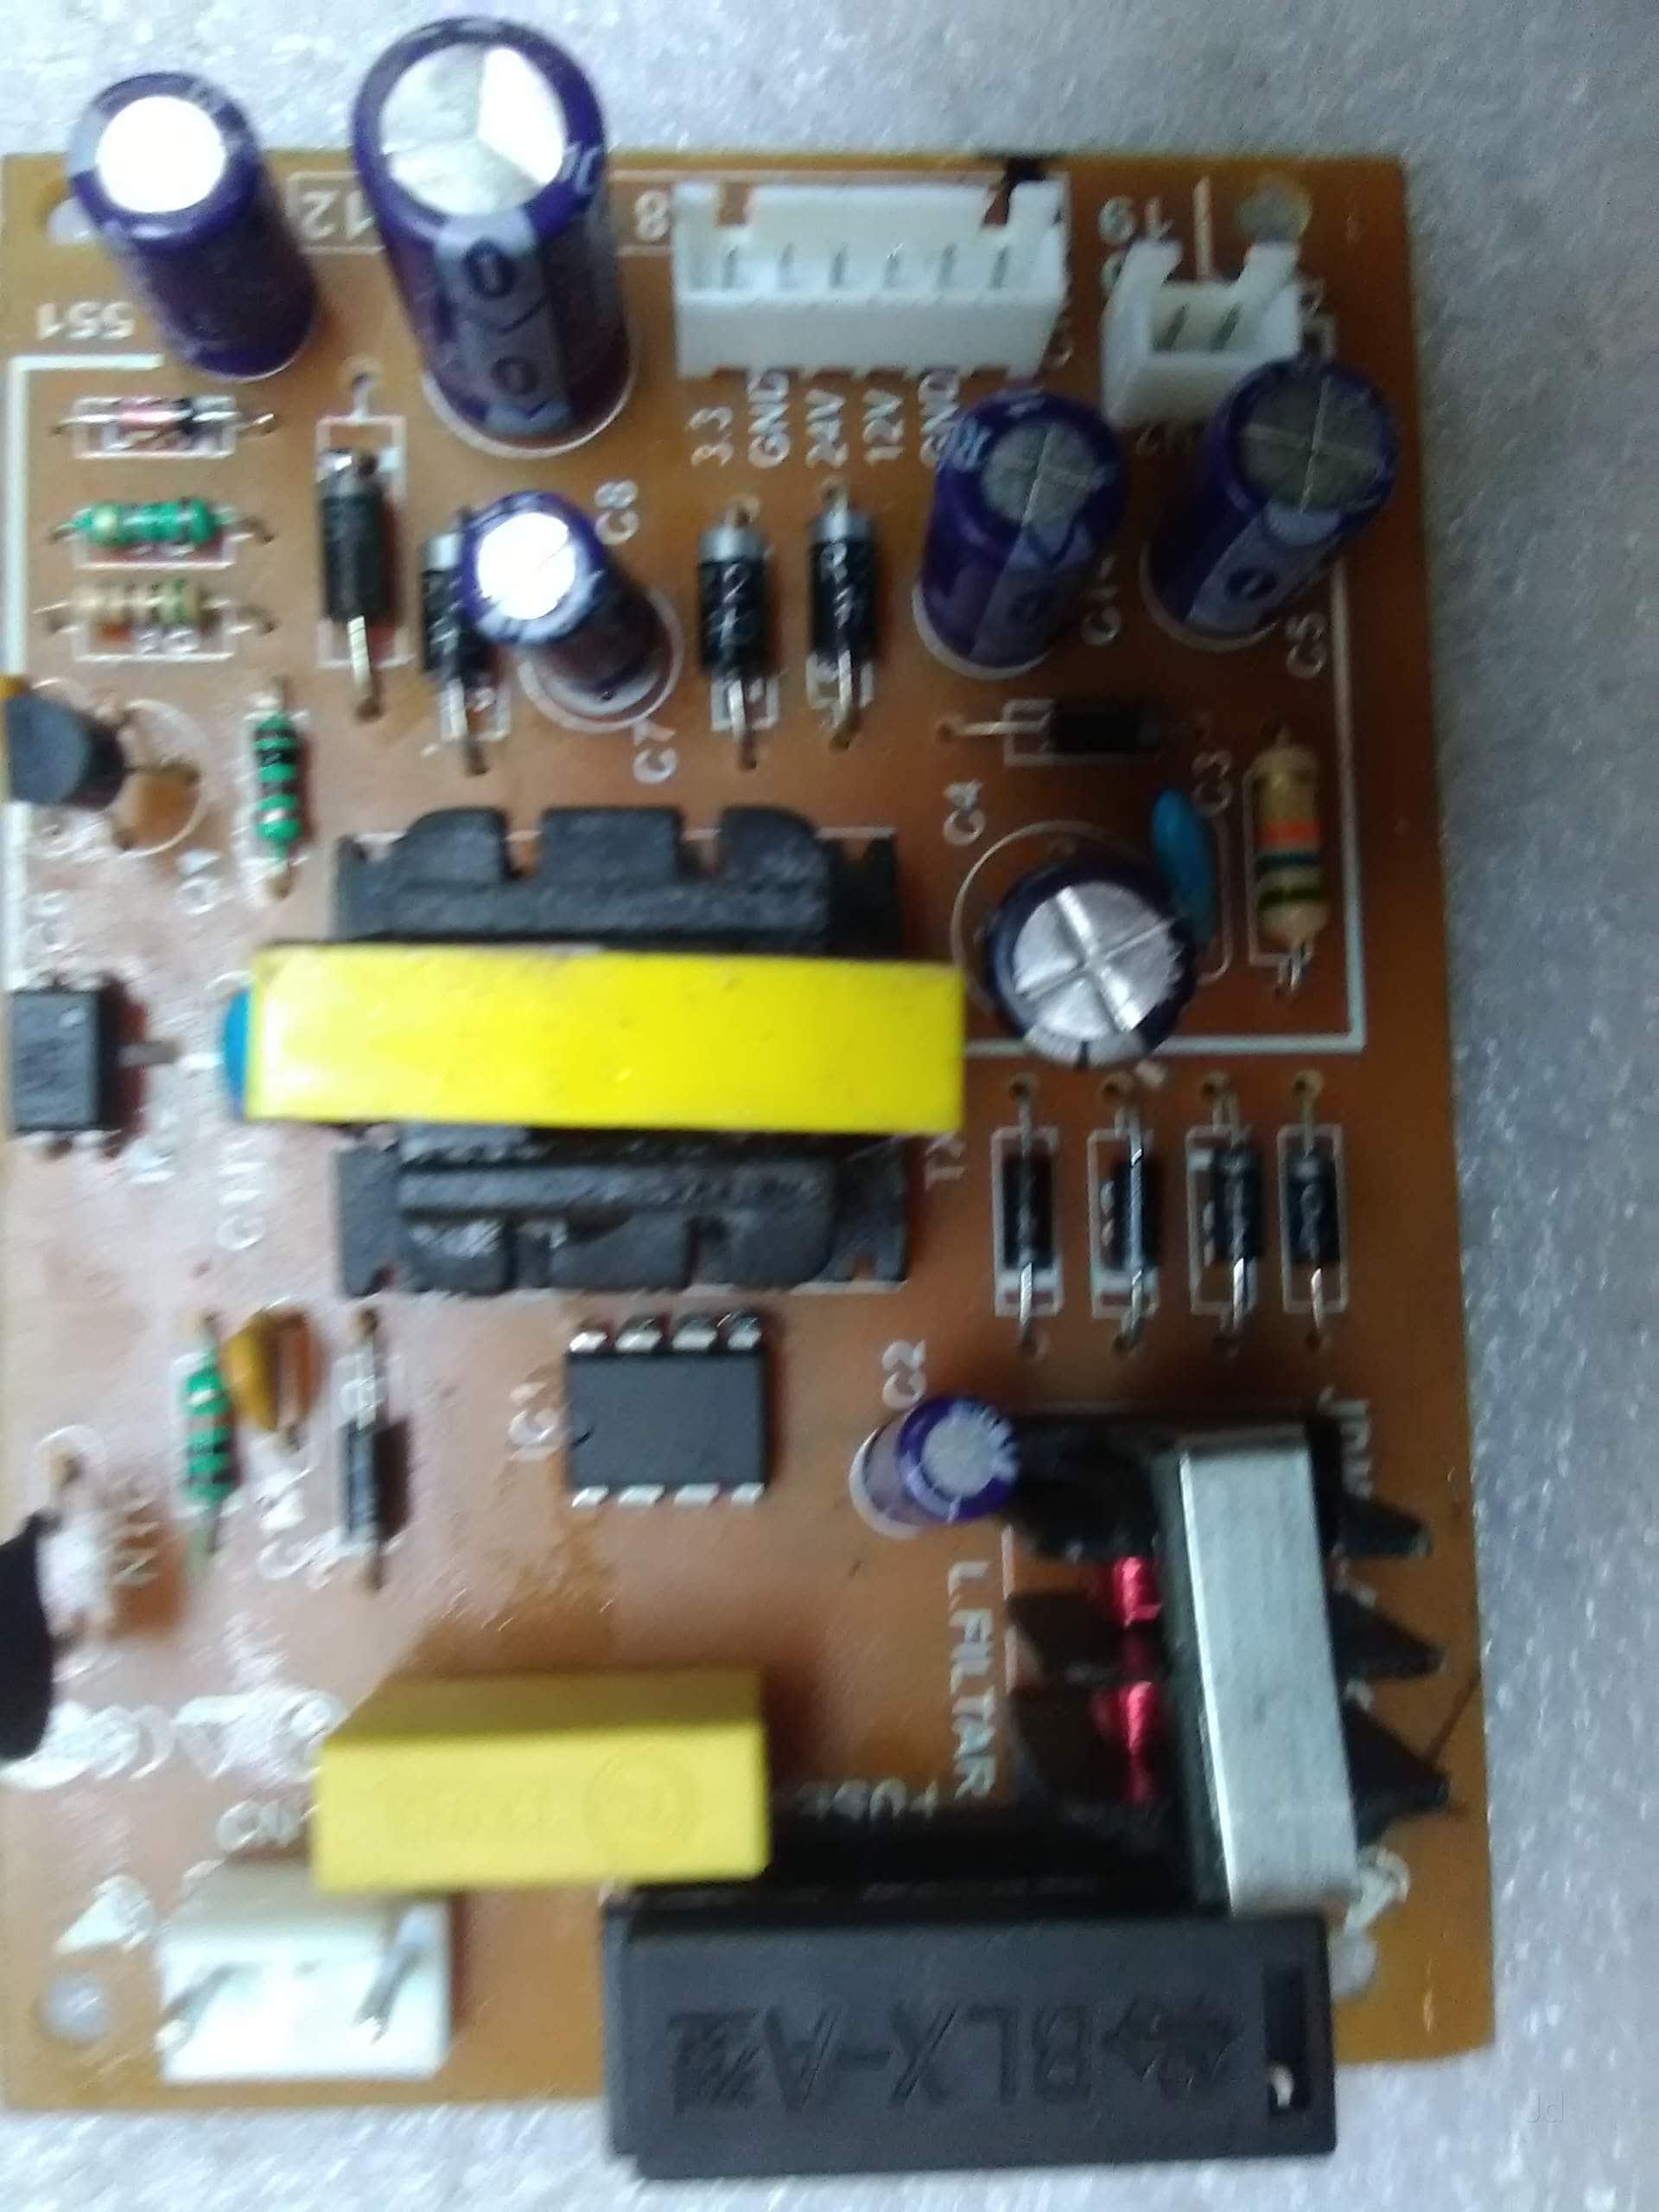 Top 3 Pcb Keyboard Manufacturers In Gurgaon Delhi Justdial Circuit Board Images